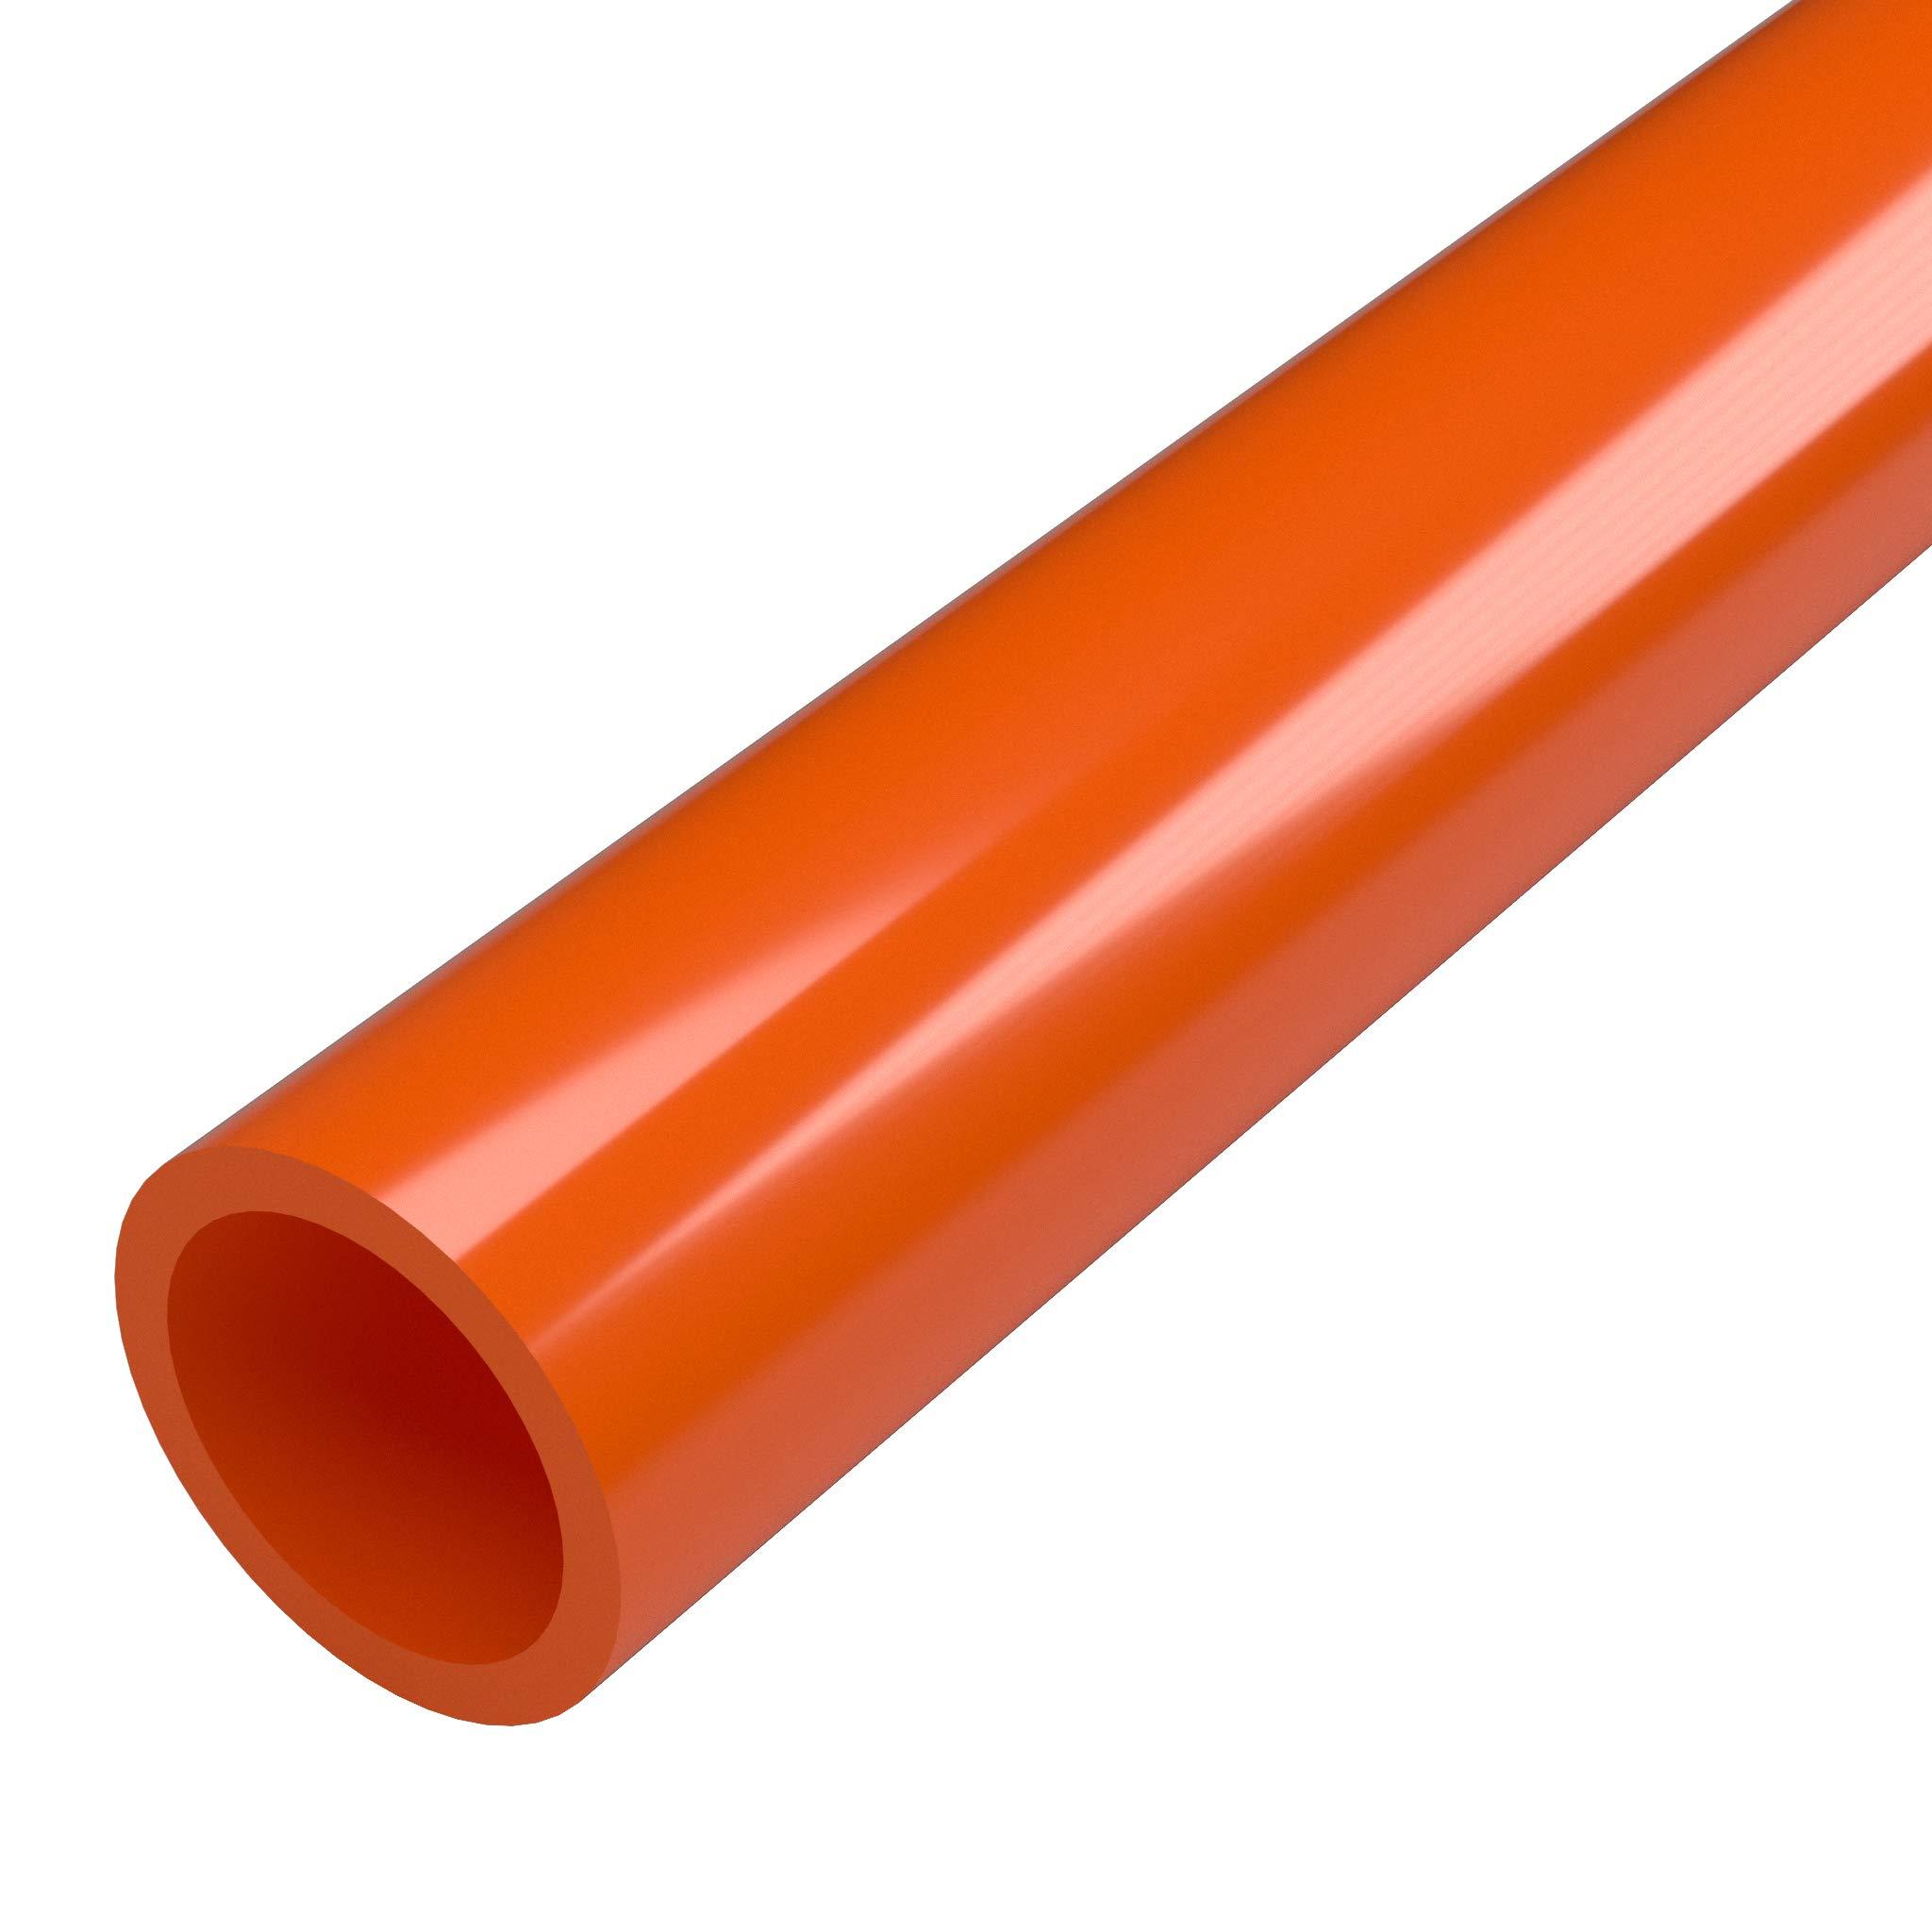 FORMUFIT P114FGP-OR-5 Schedule 40 PVC Pipe, Furniture Grade, 5', 1-1/4'' Size, Orange